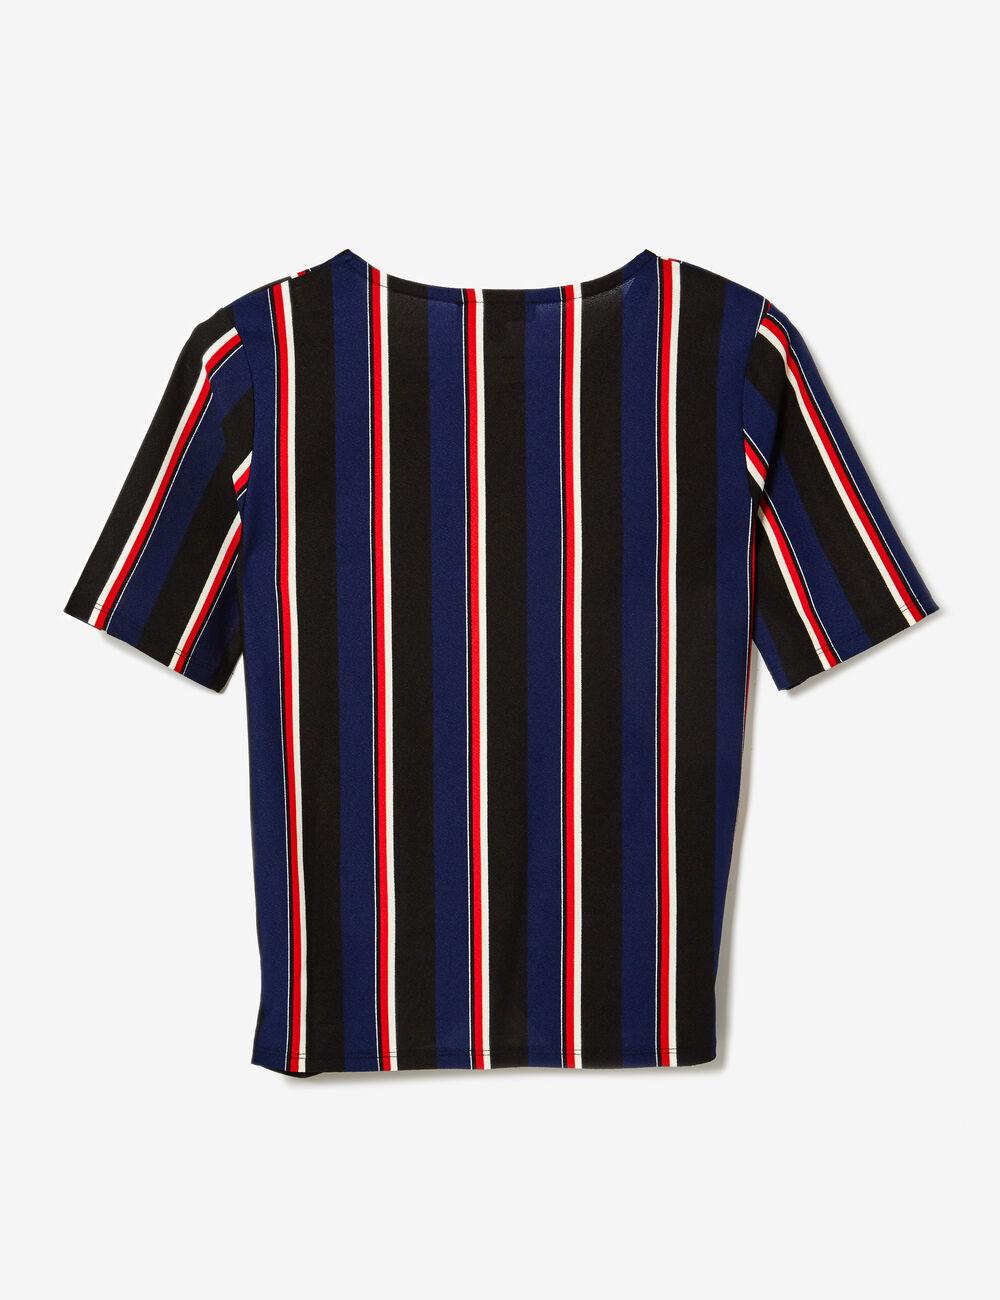 tee shirt ray effet noeud noir bleu marine rouge et. Black Bedroom Furniture Sets. Home Design Ideas